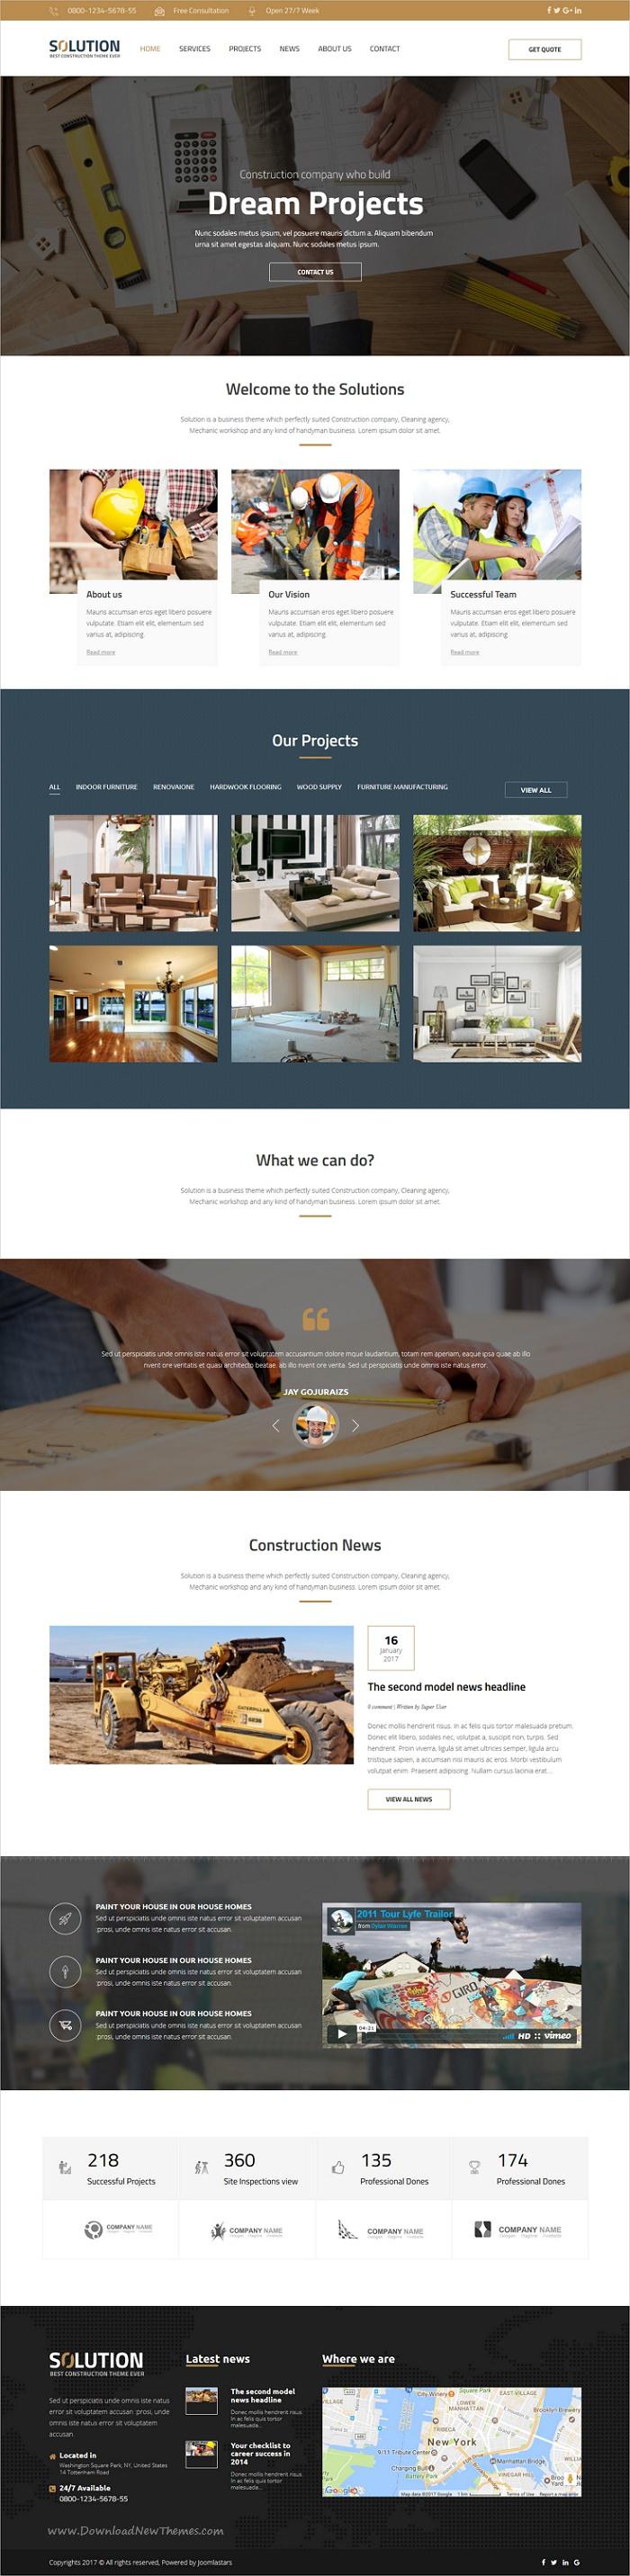 Solution - Multipurpose Small Business Joomla Theme